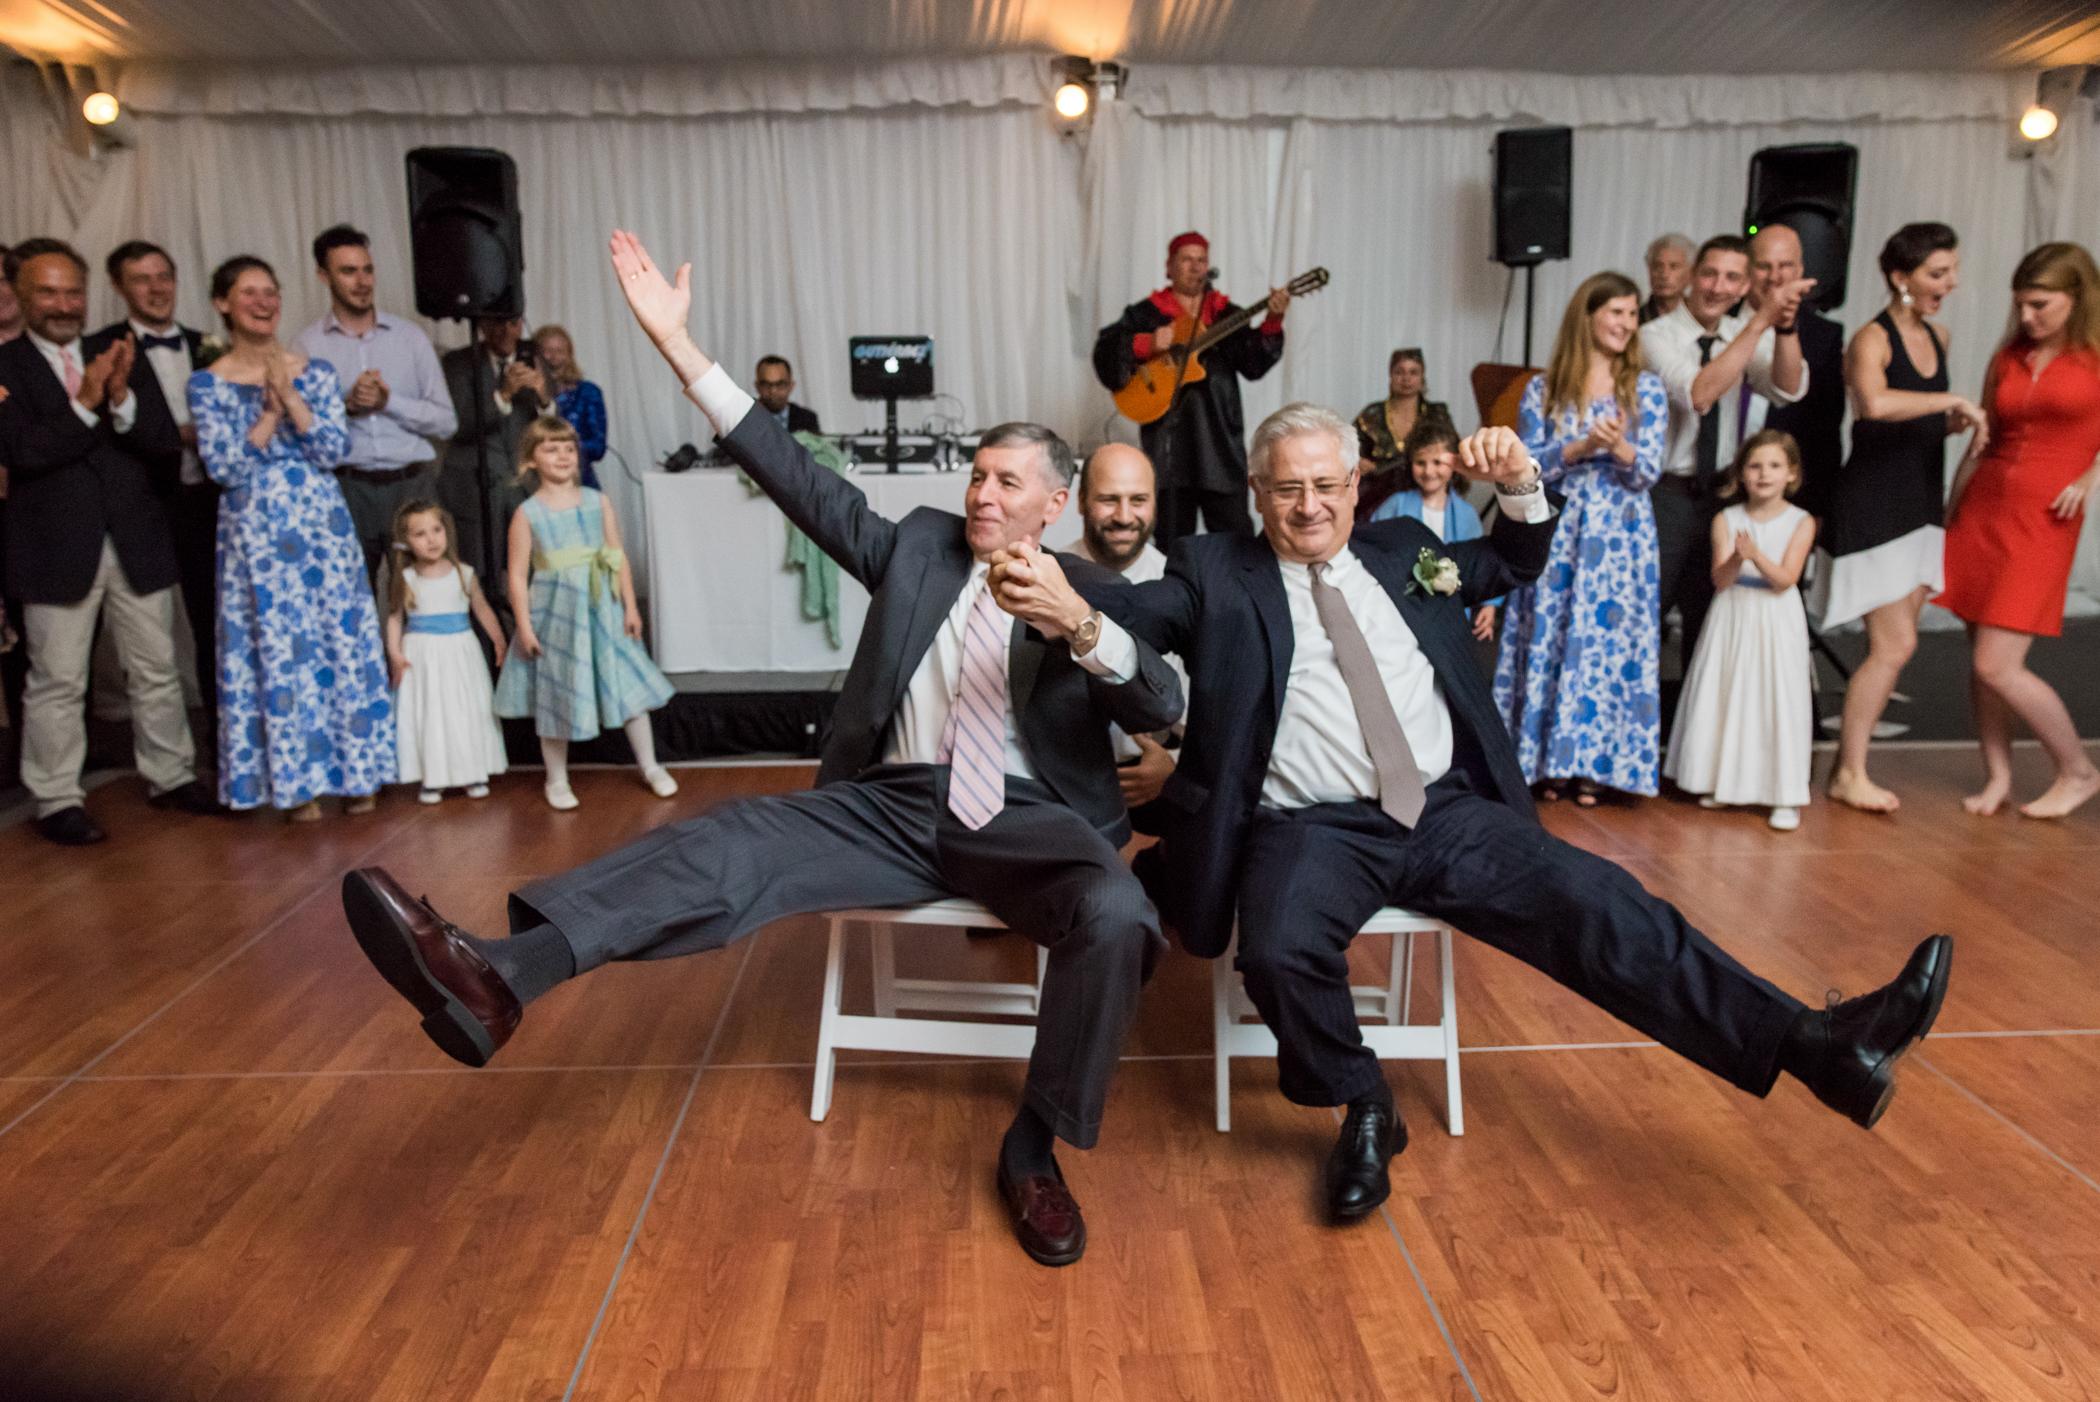 Stefy Hilmer Photography-russian dancing at wedding reception at Lyndhurst Castle in Tarrytown.jpg